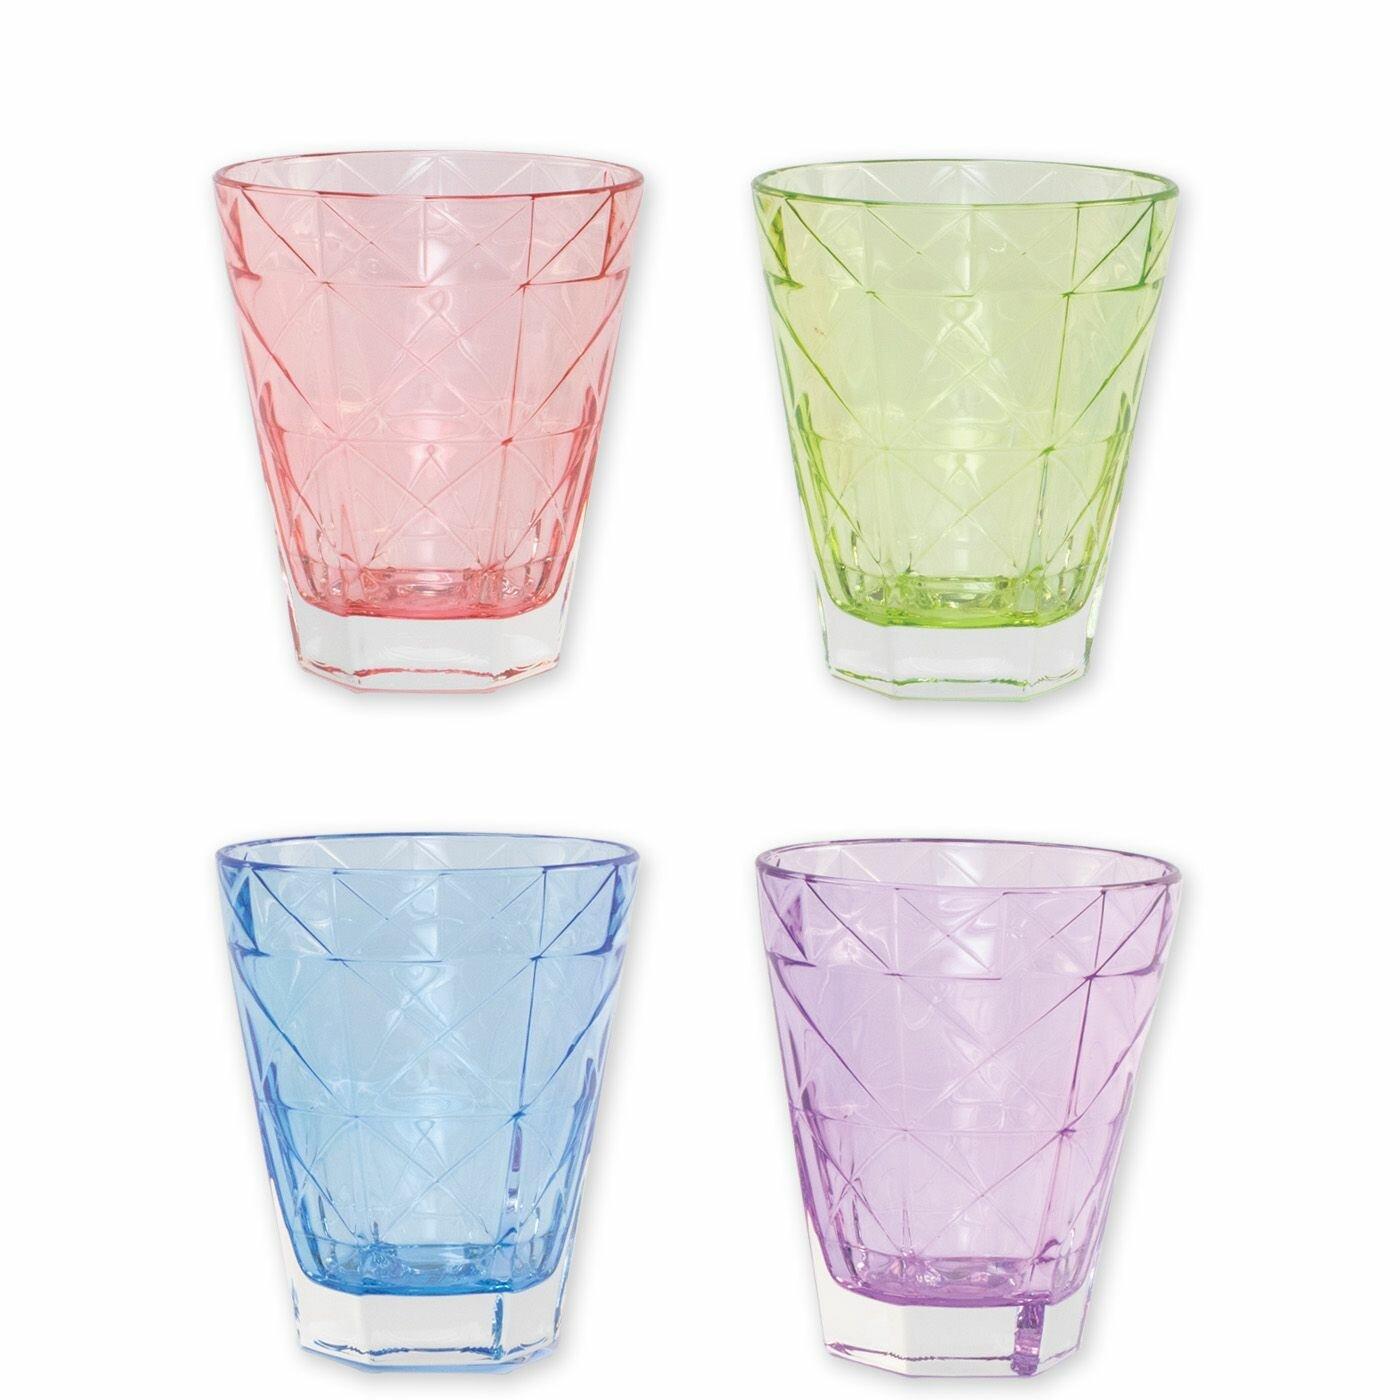 Vietri Viva Prism 4 Piece Drinking Glass Set Reviews Wayfair